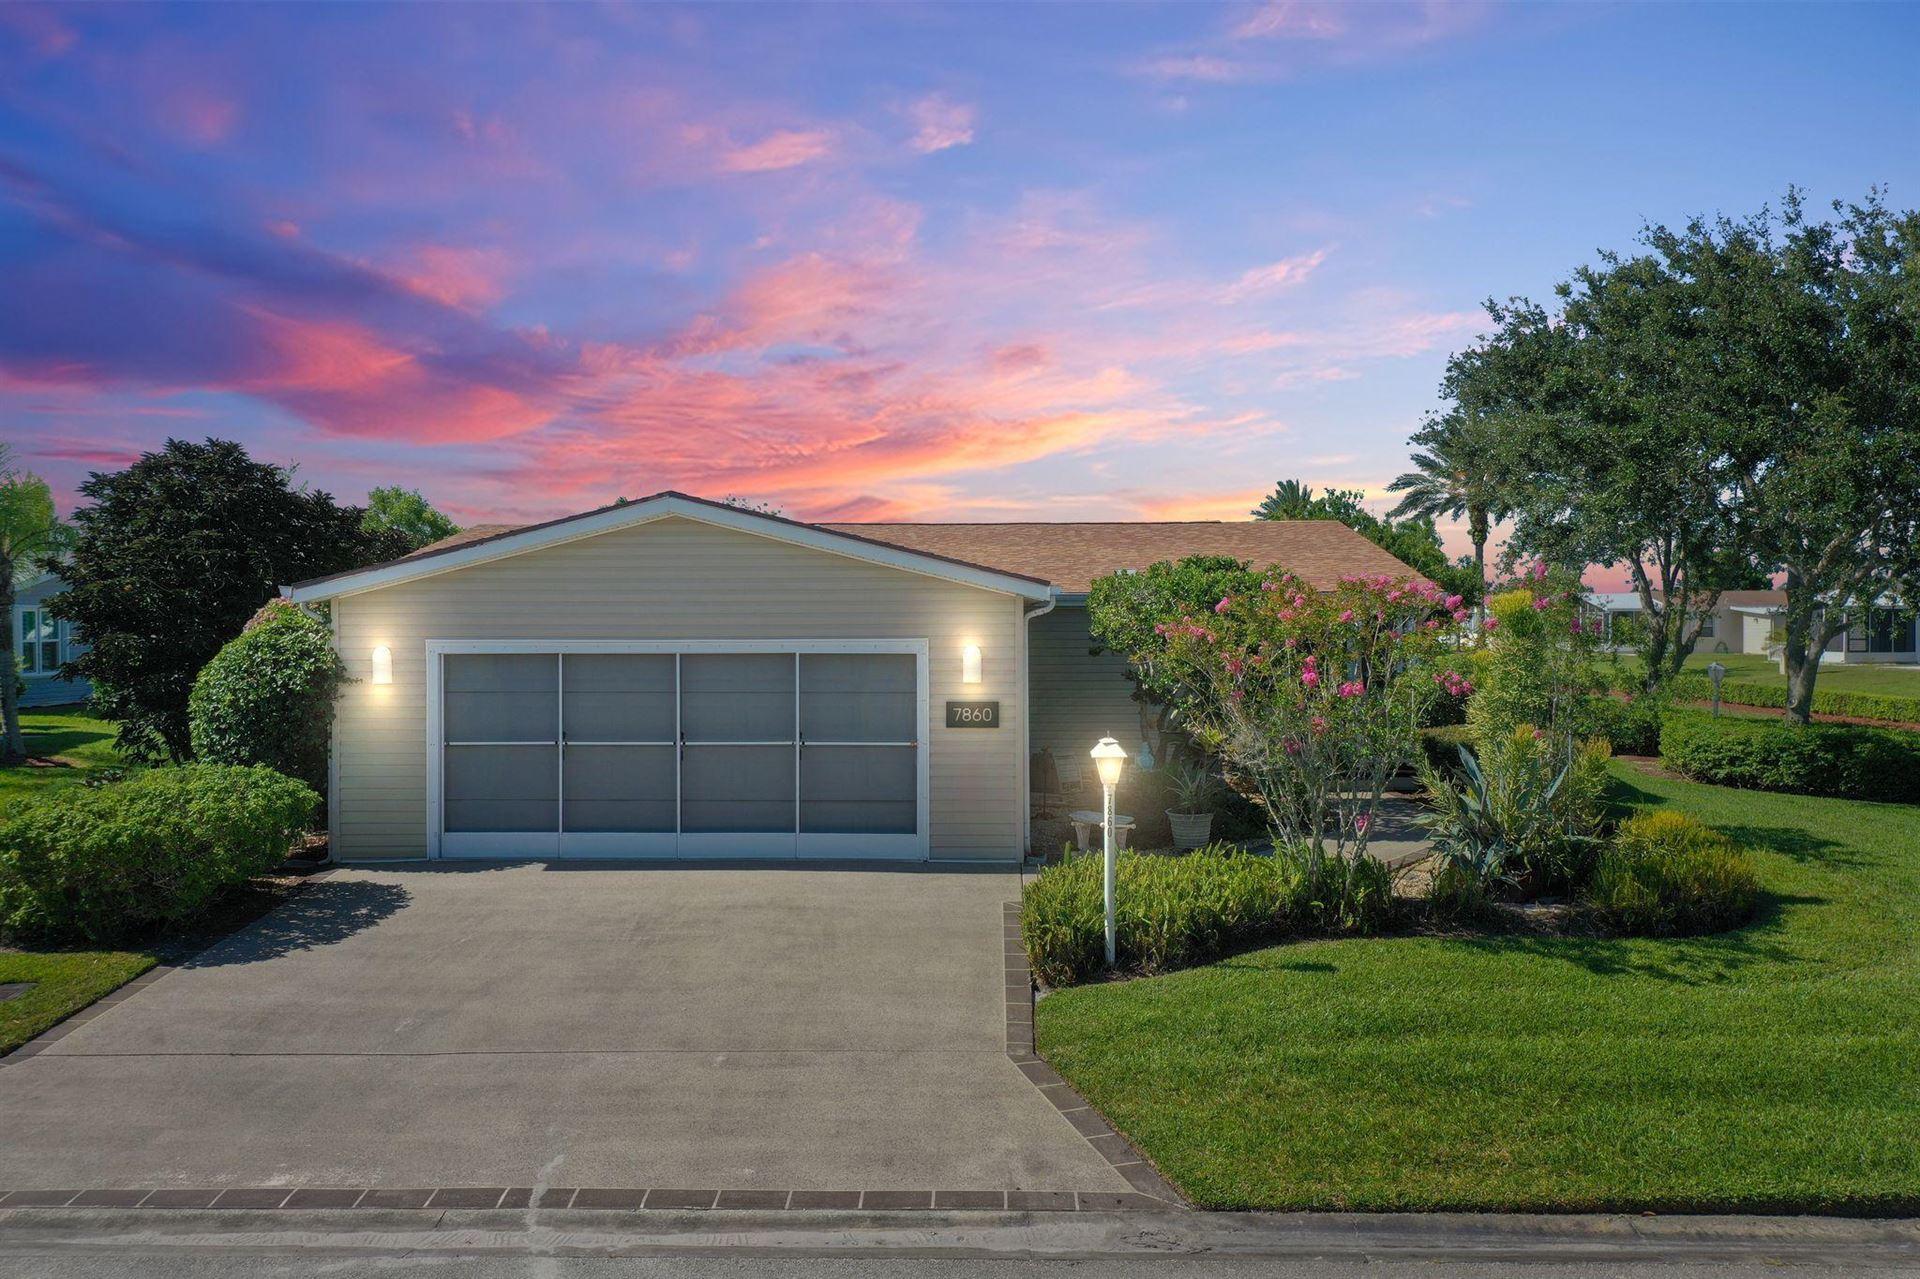 7860 White Ibis Lane, Port Saint Lucie, FL 34952 - MLS#: RX-10732173